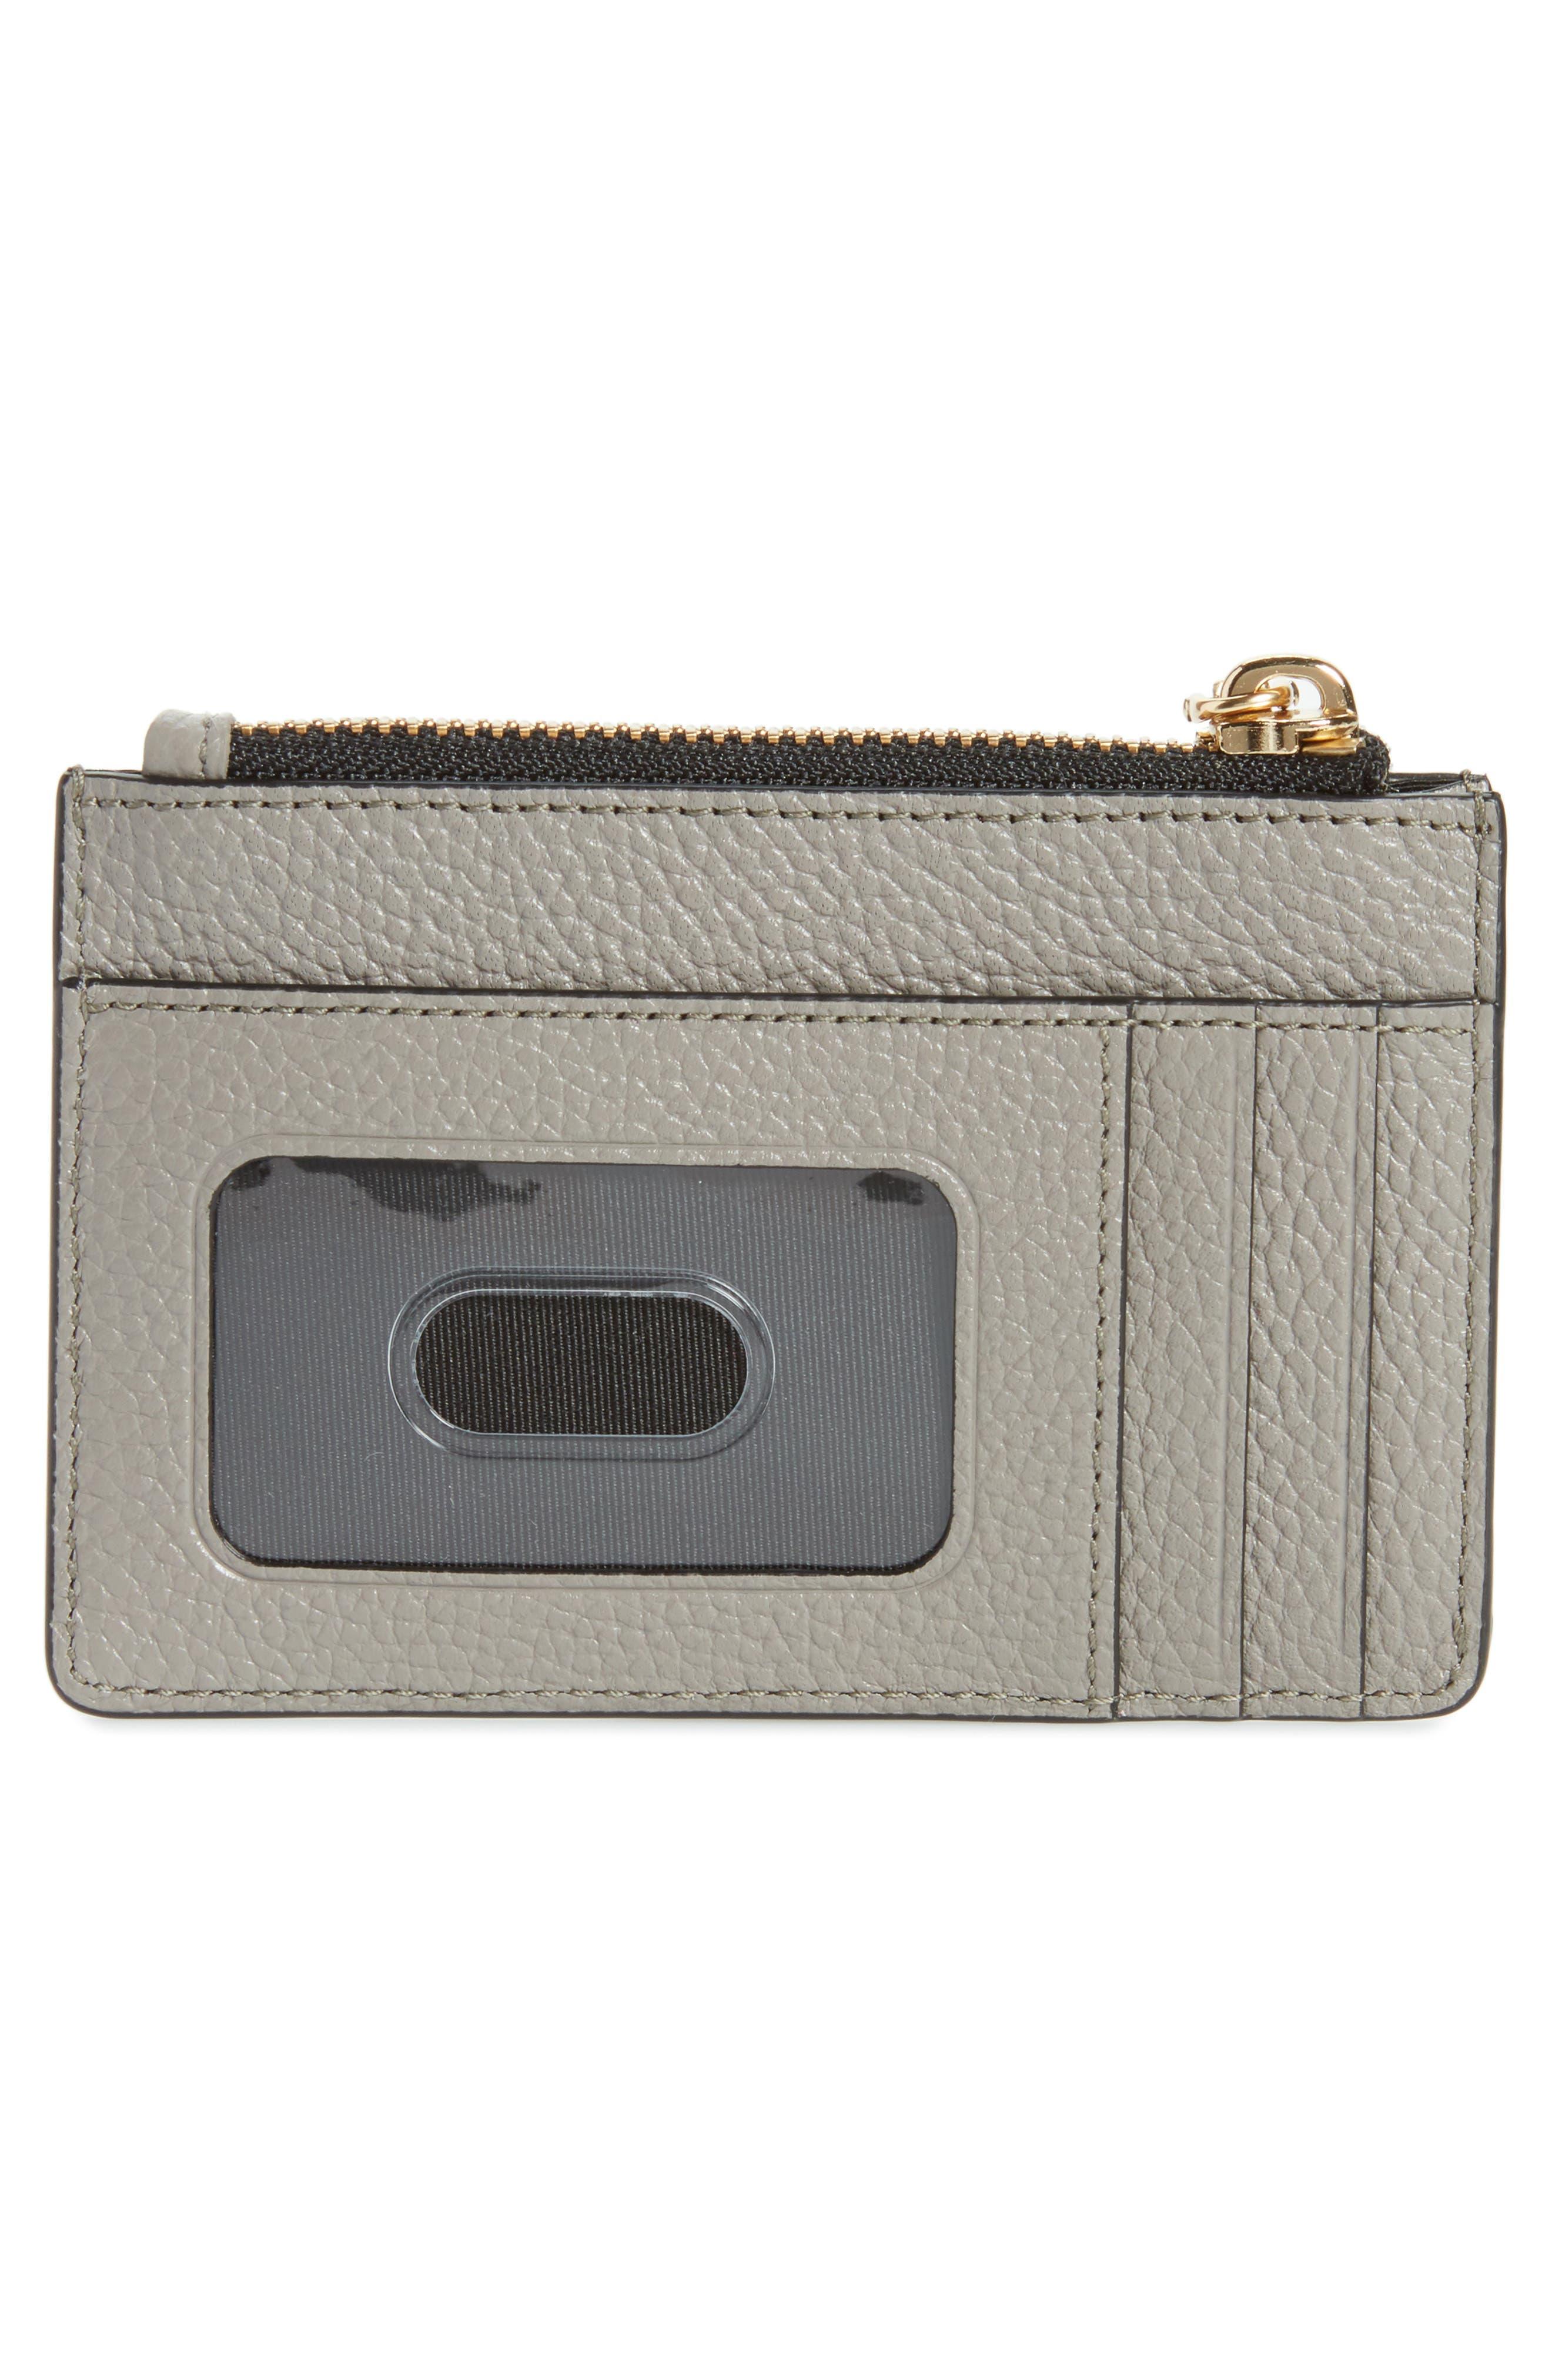 Gotham Leather Wallet,                             Alternate thumbnail 4, color,                             Stone Grey